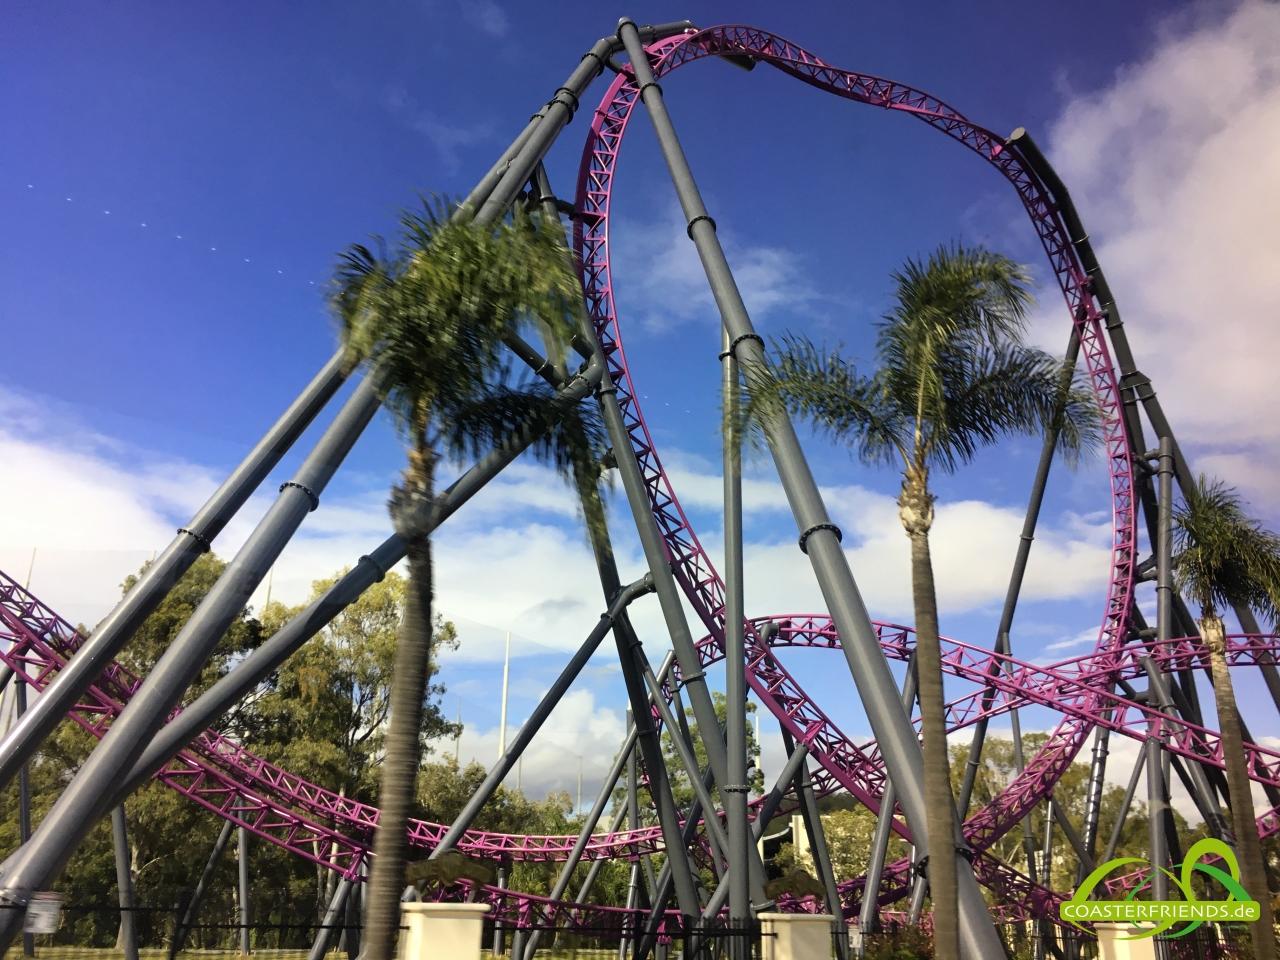 Australien - https://coasterfriends.de/joomla//images/pcp_parkdetails/australien/o2986_warner_bros._movie_world/content3.jpg